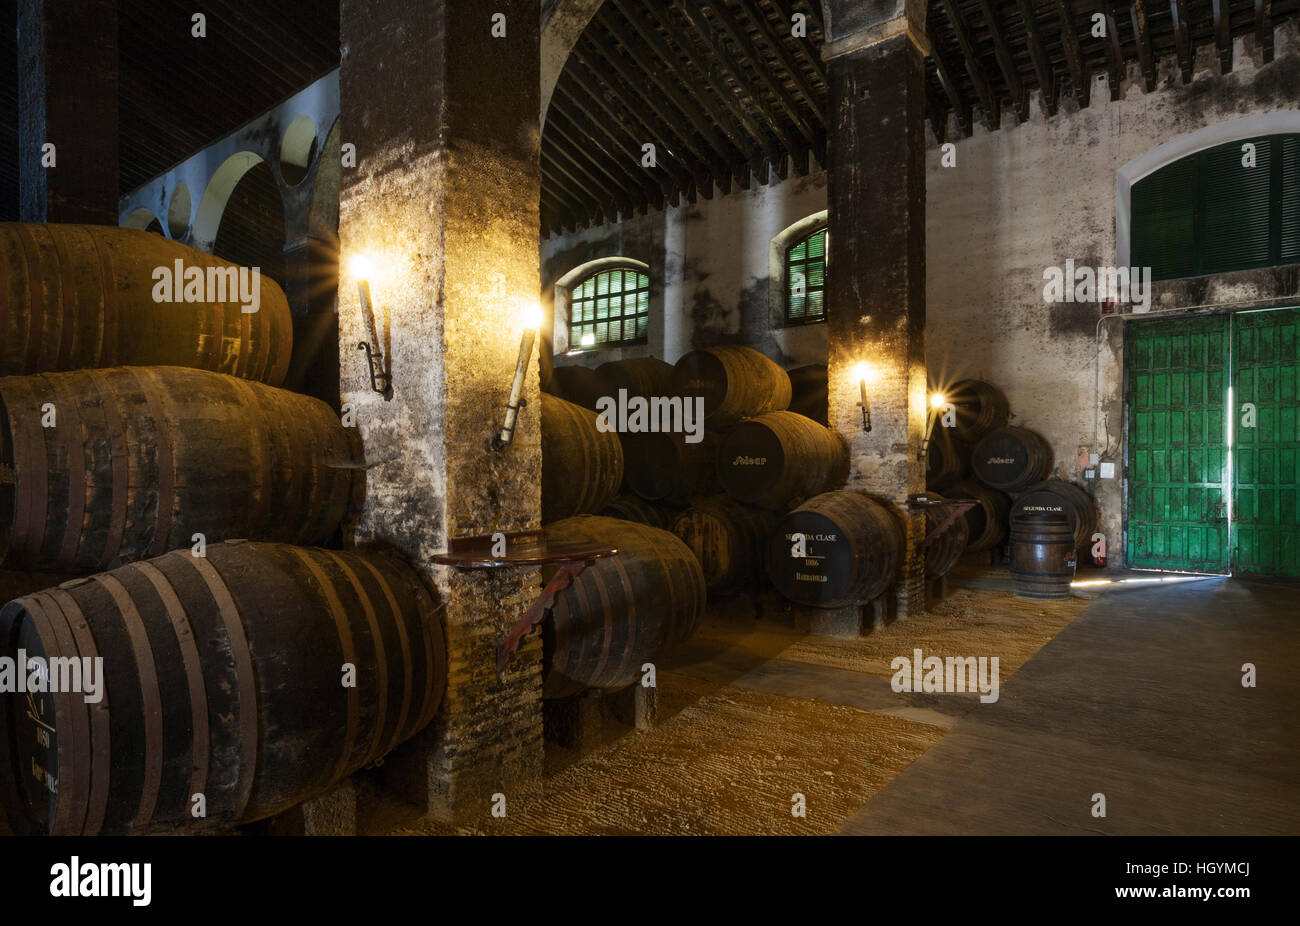 Wine Bar Barcelona Stockfotos & Wine Bar Barcelona Bilder - Alamy